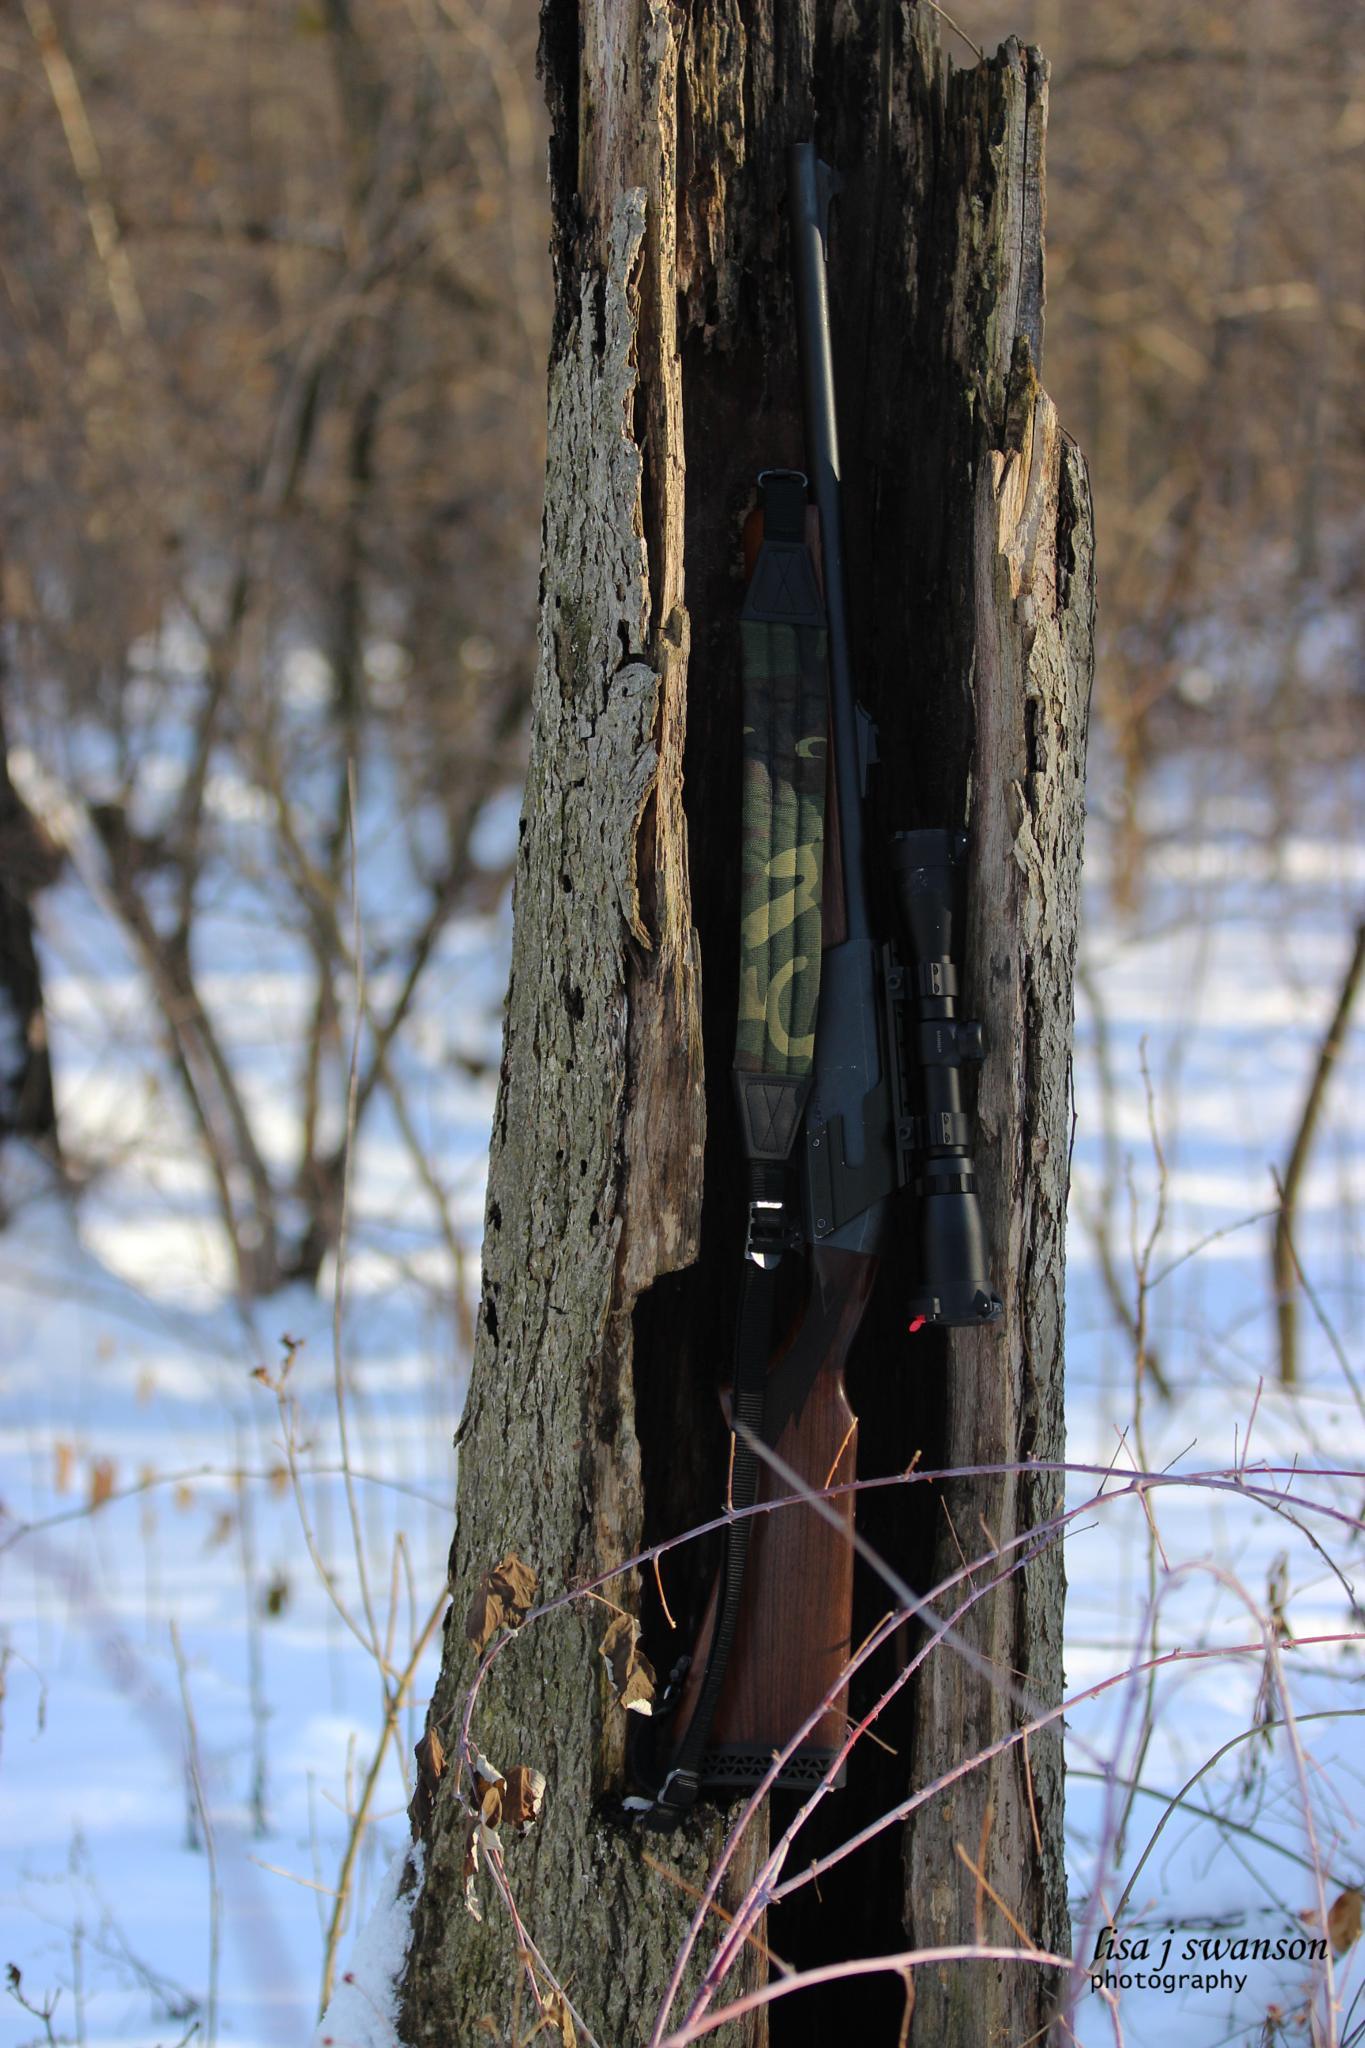 Tree trunk gun by lisa.meyersswanson